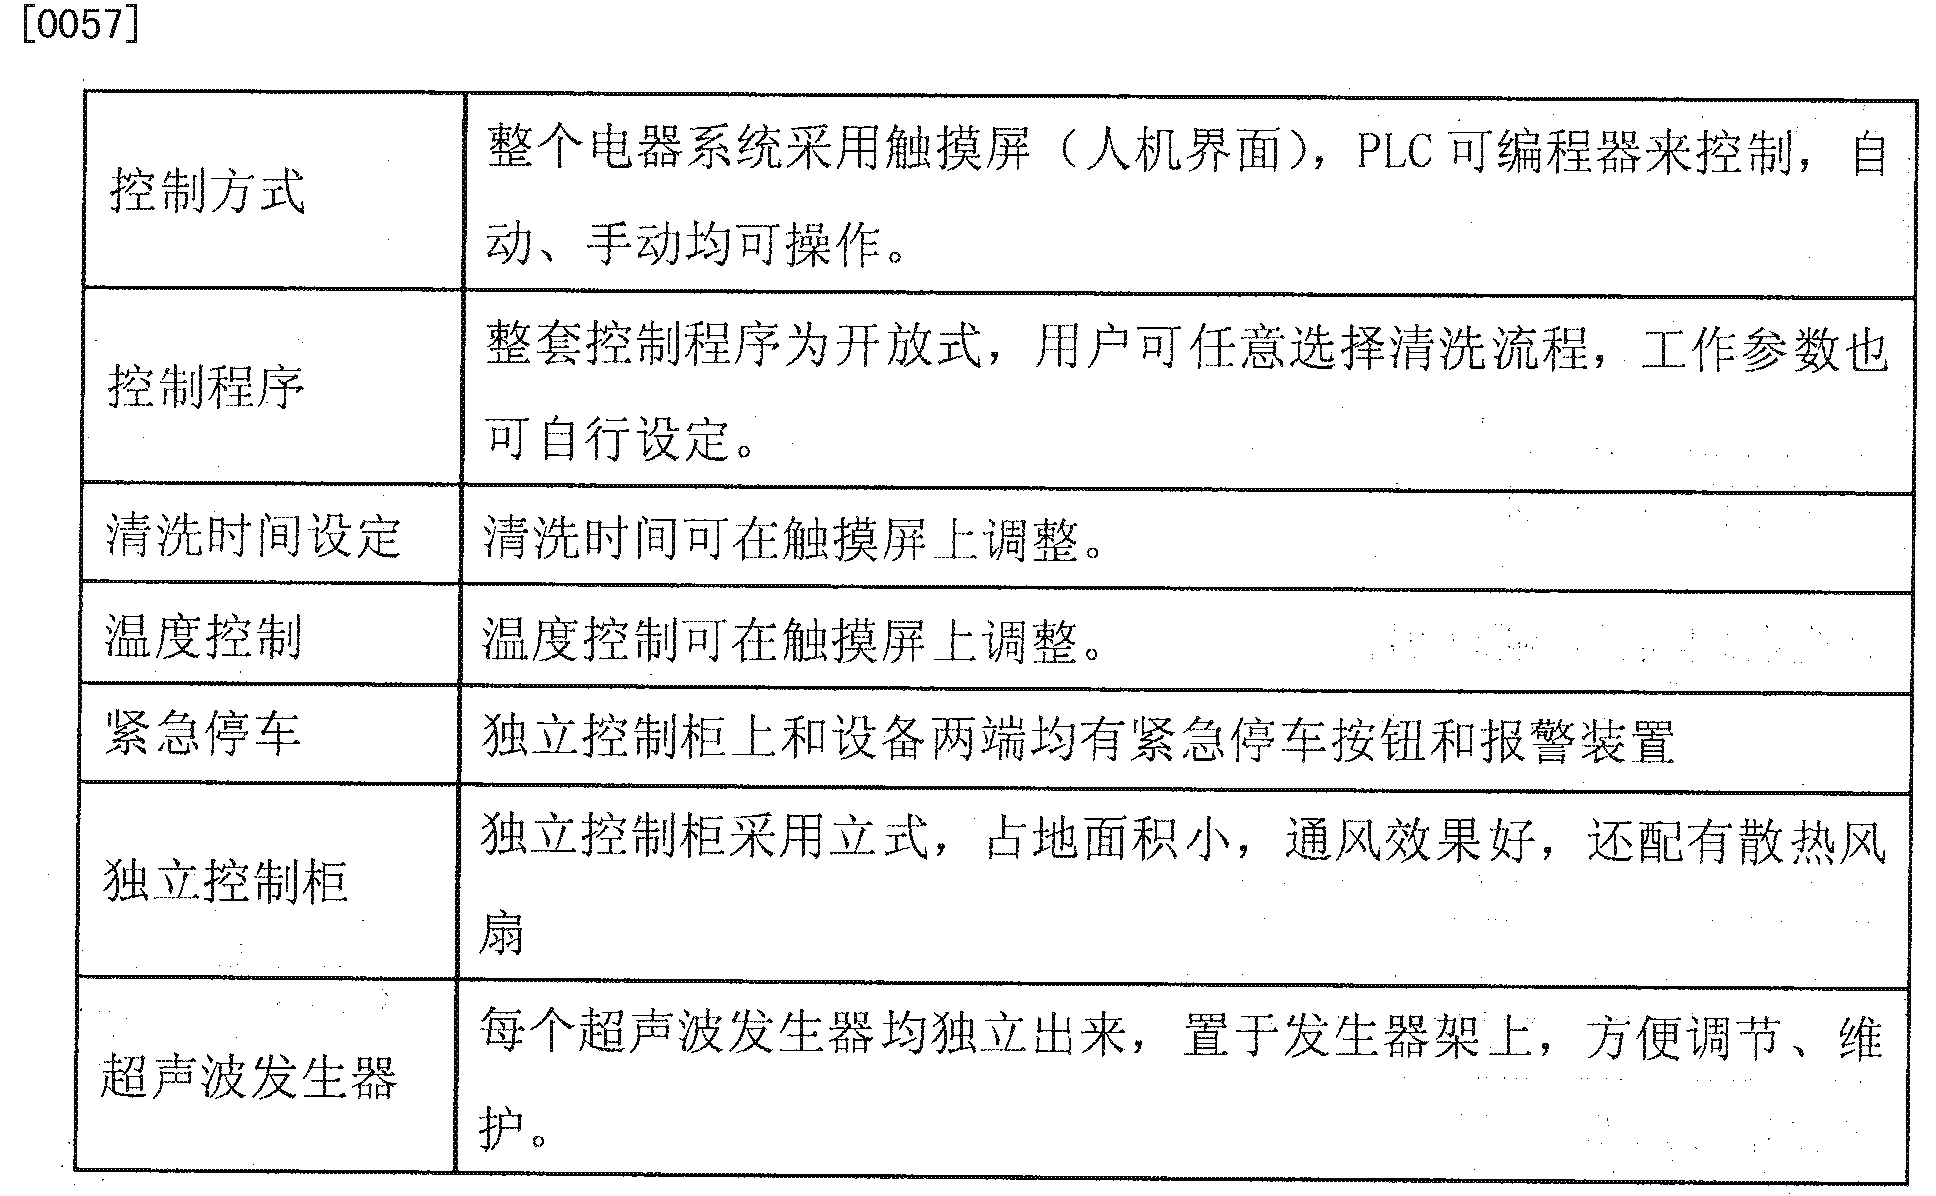 Figure CN204035120UD00132